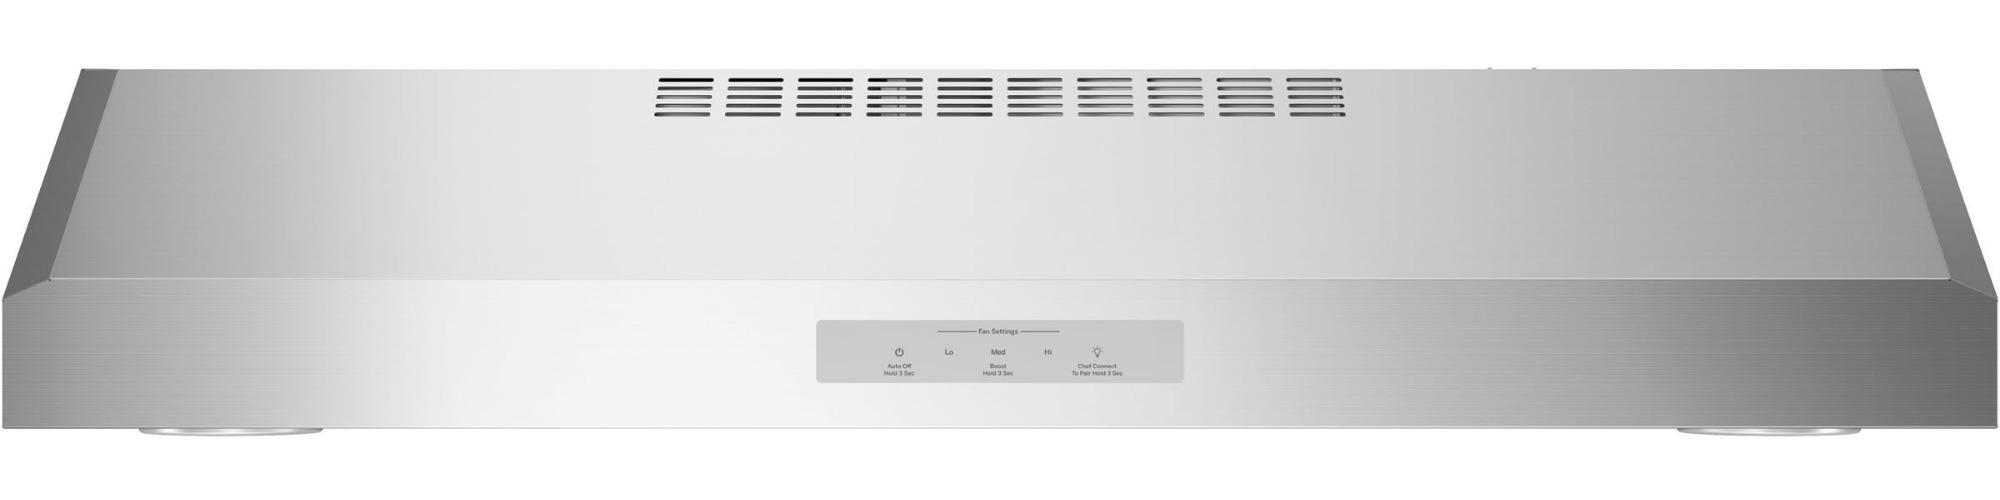 GE Profile PVX7300SJSS 30